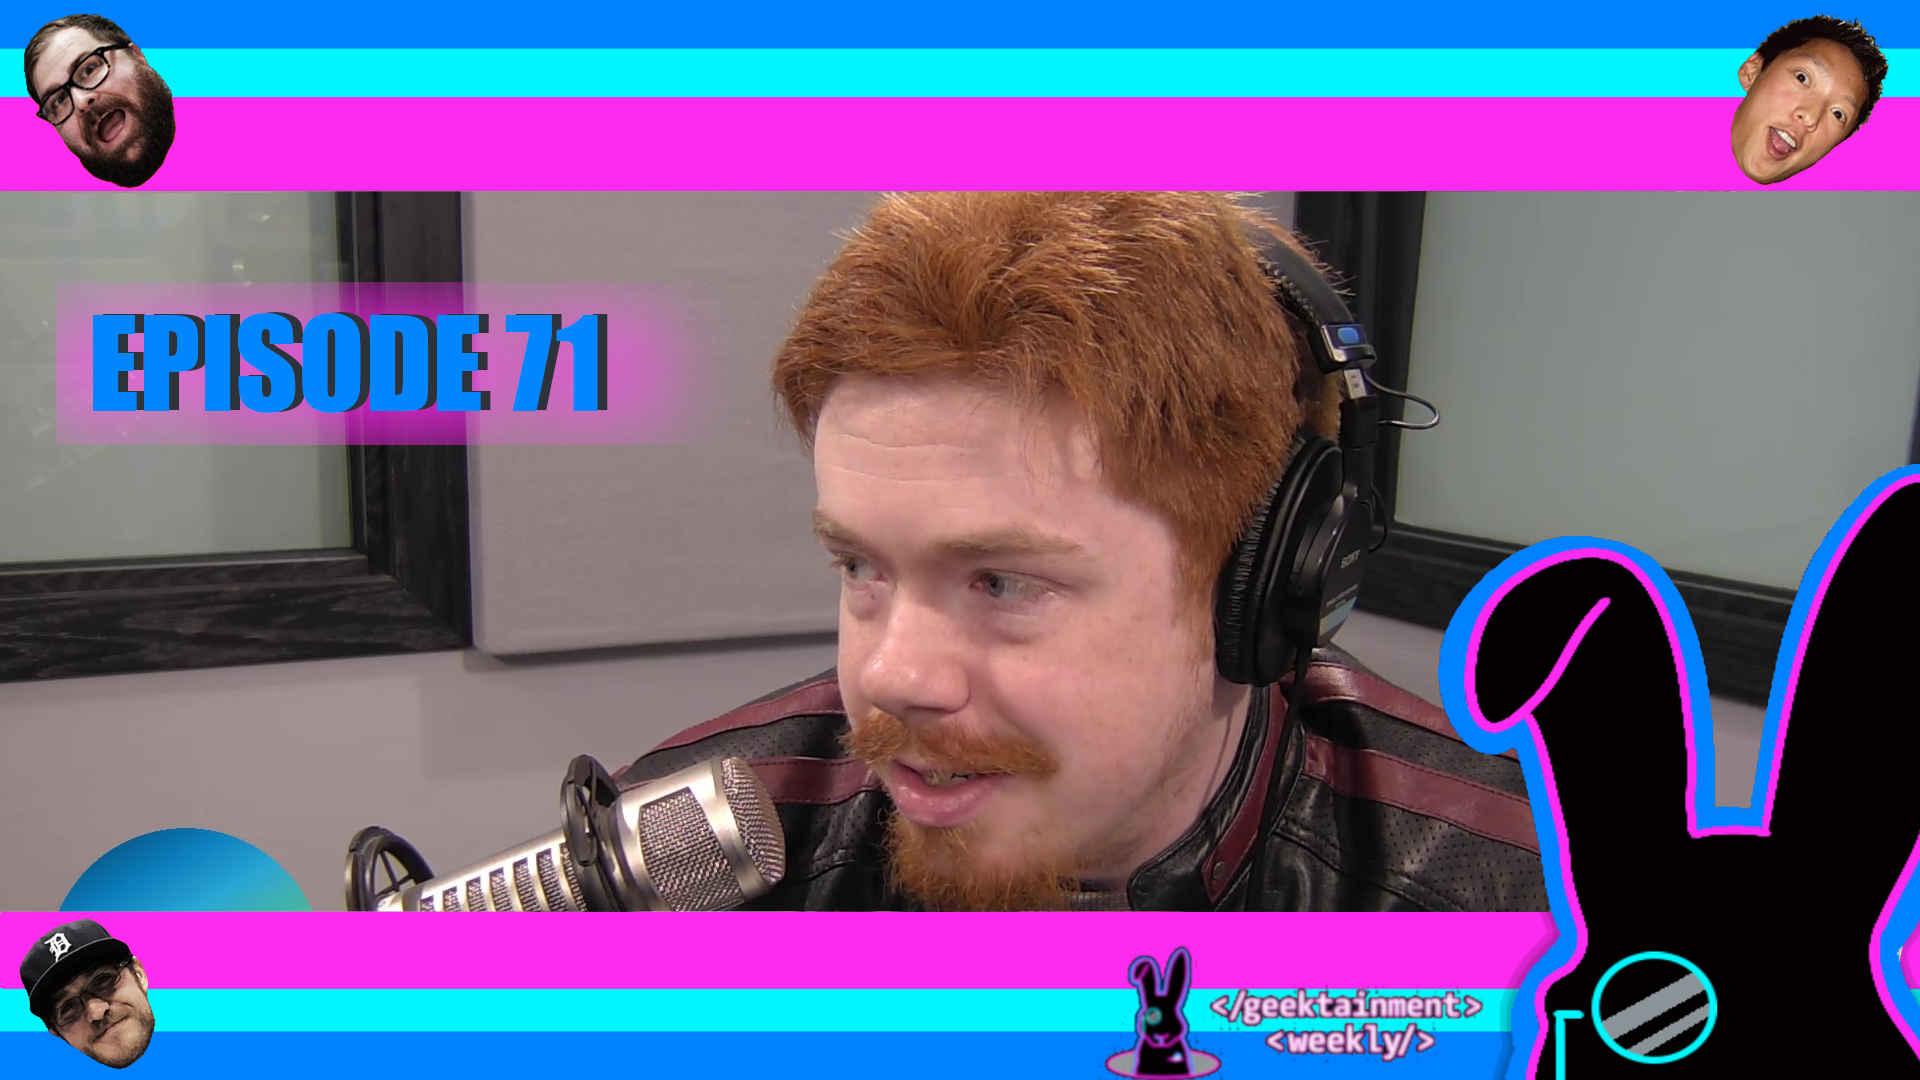 Geektainment Weekly - Episode 71